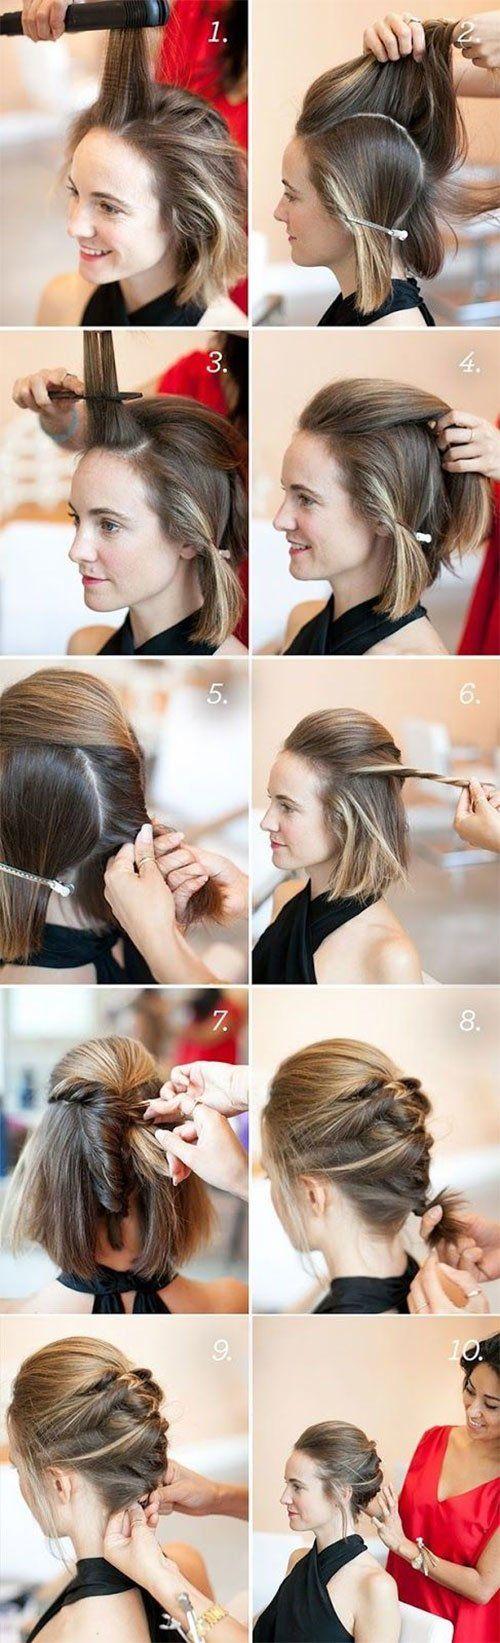 Source josefina pinterest hair style short hair and updo